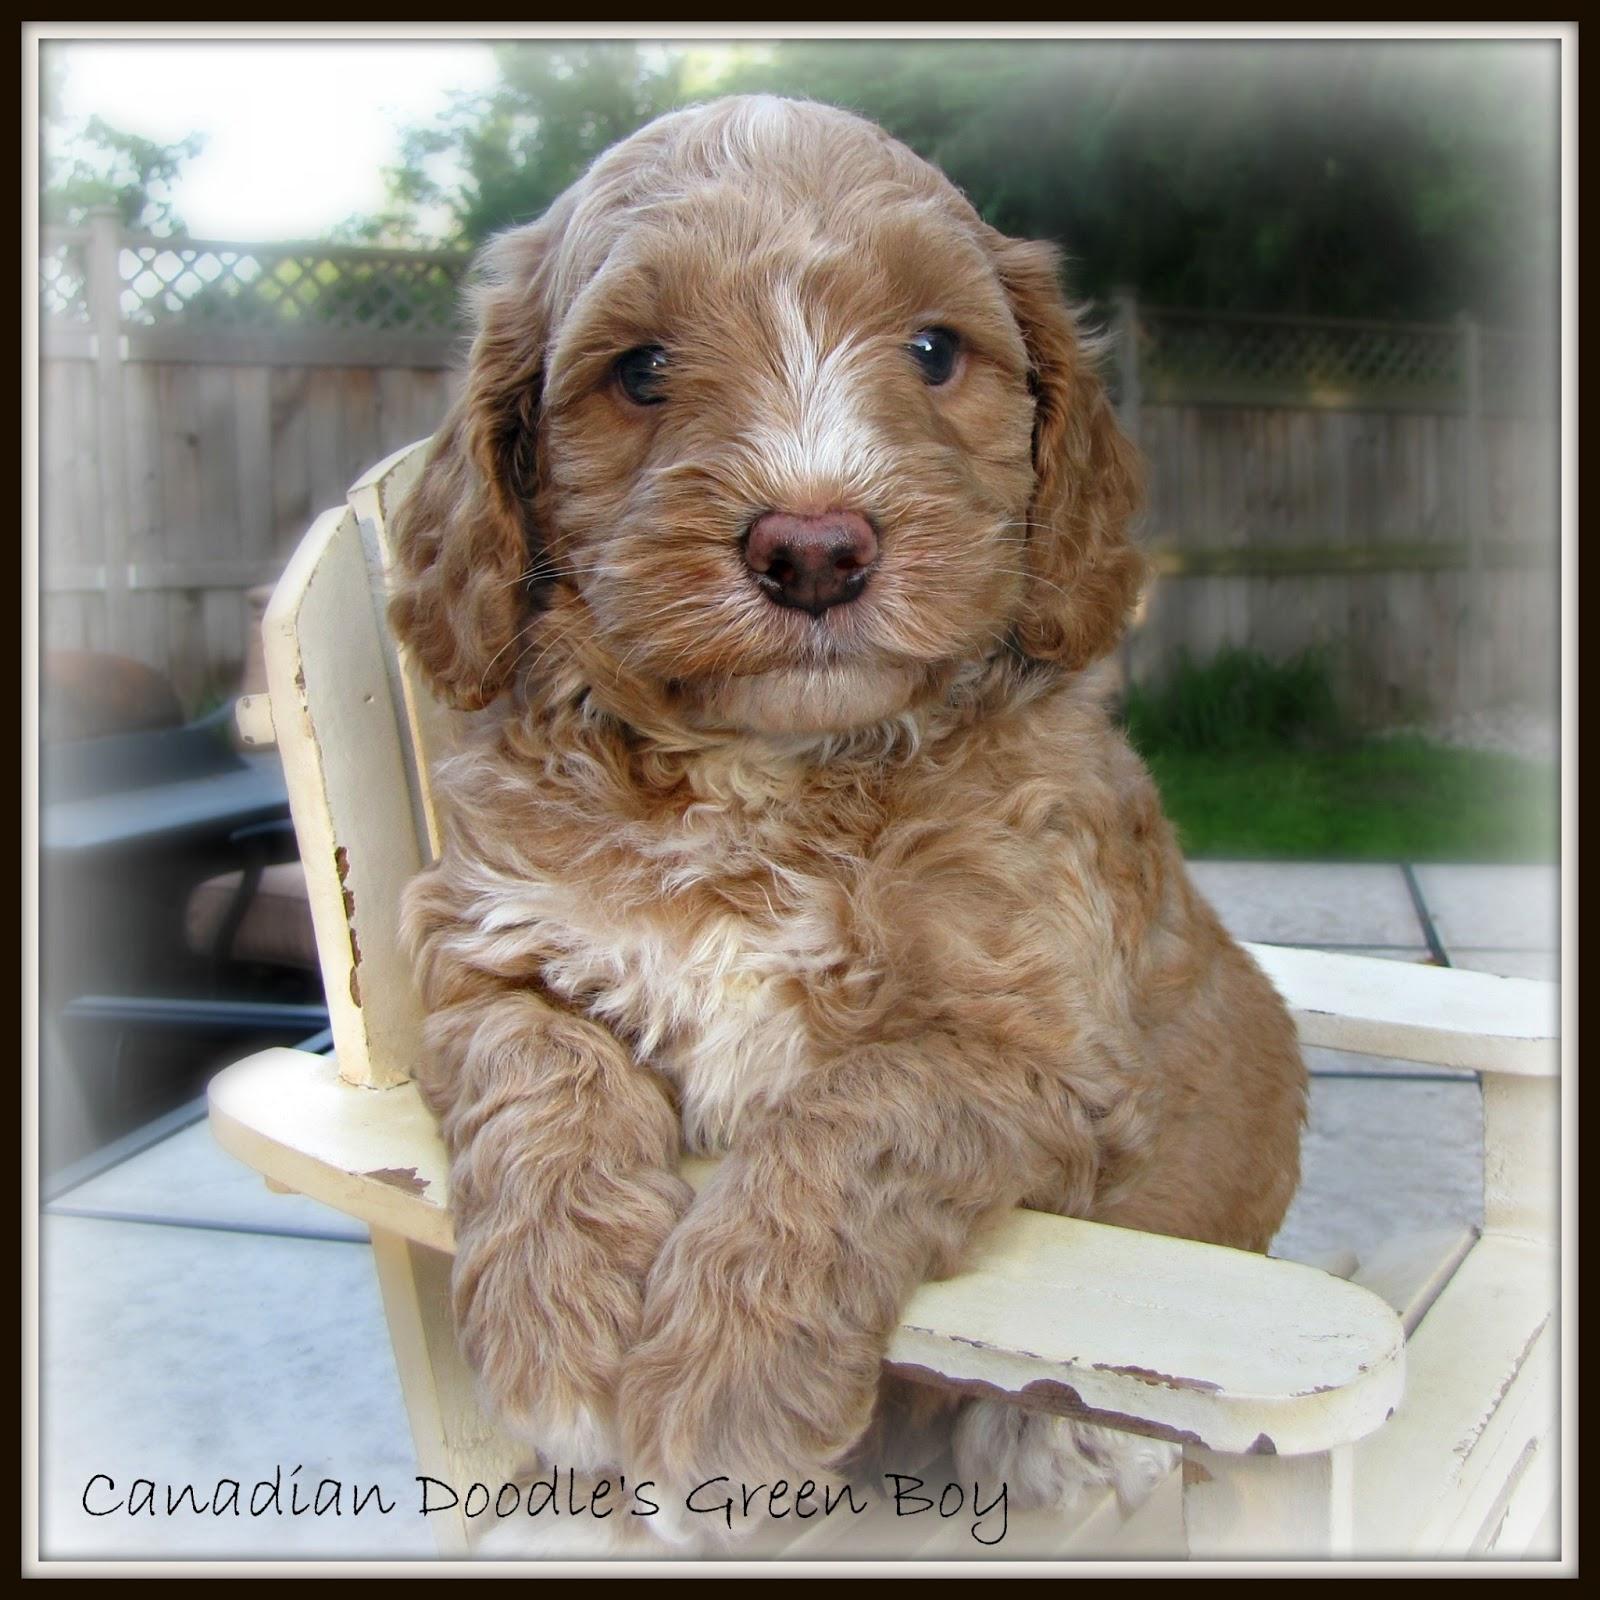 Canadian Doodle Puppies: Shiraz's pups at 5 weeks